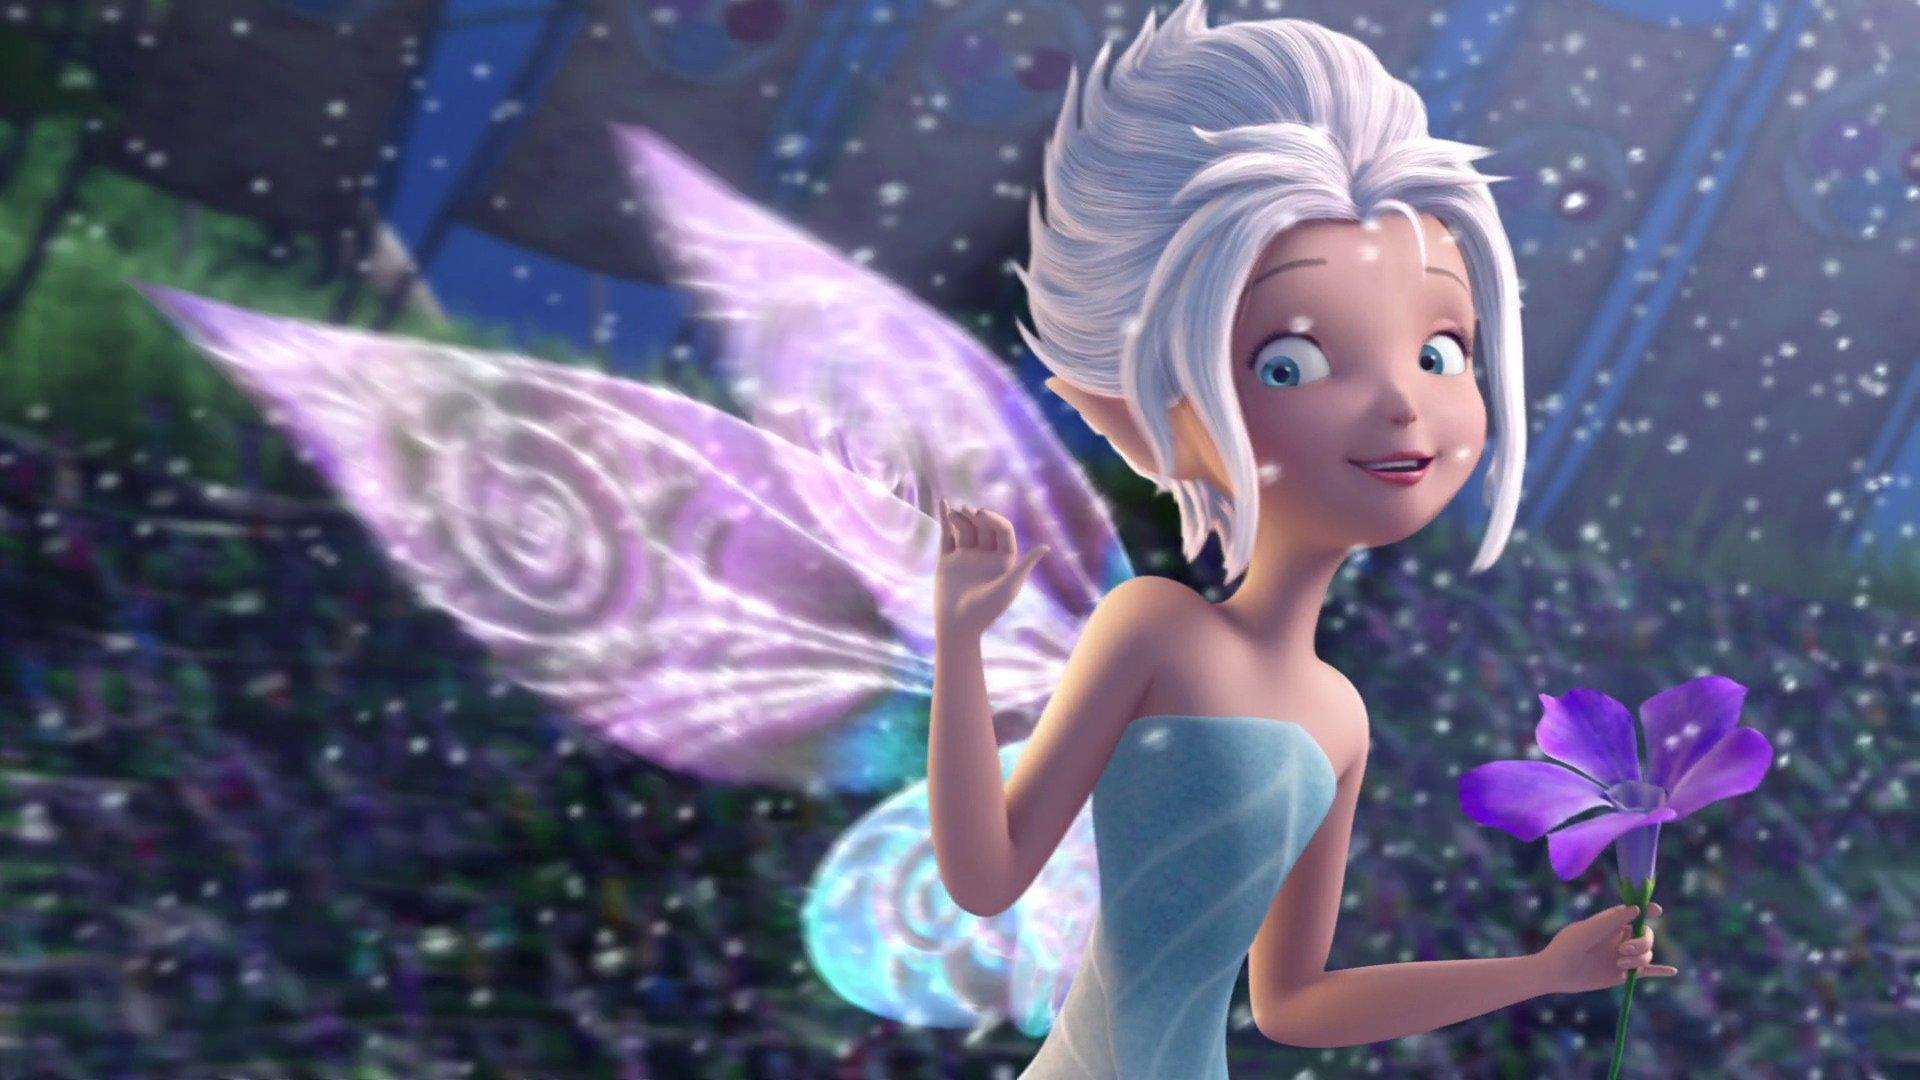 Смотреть картинки фея